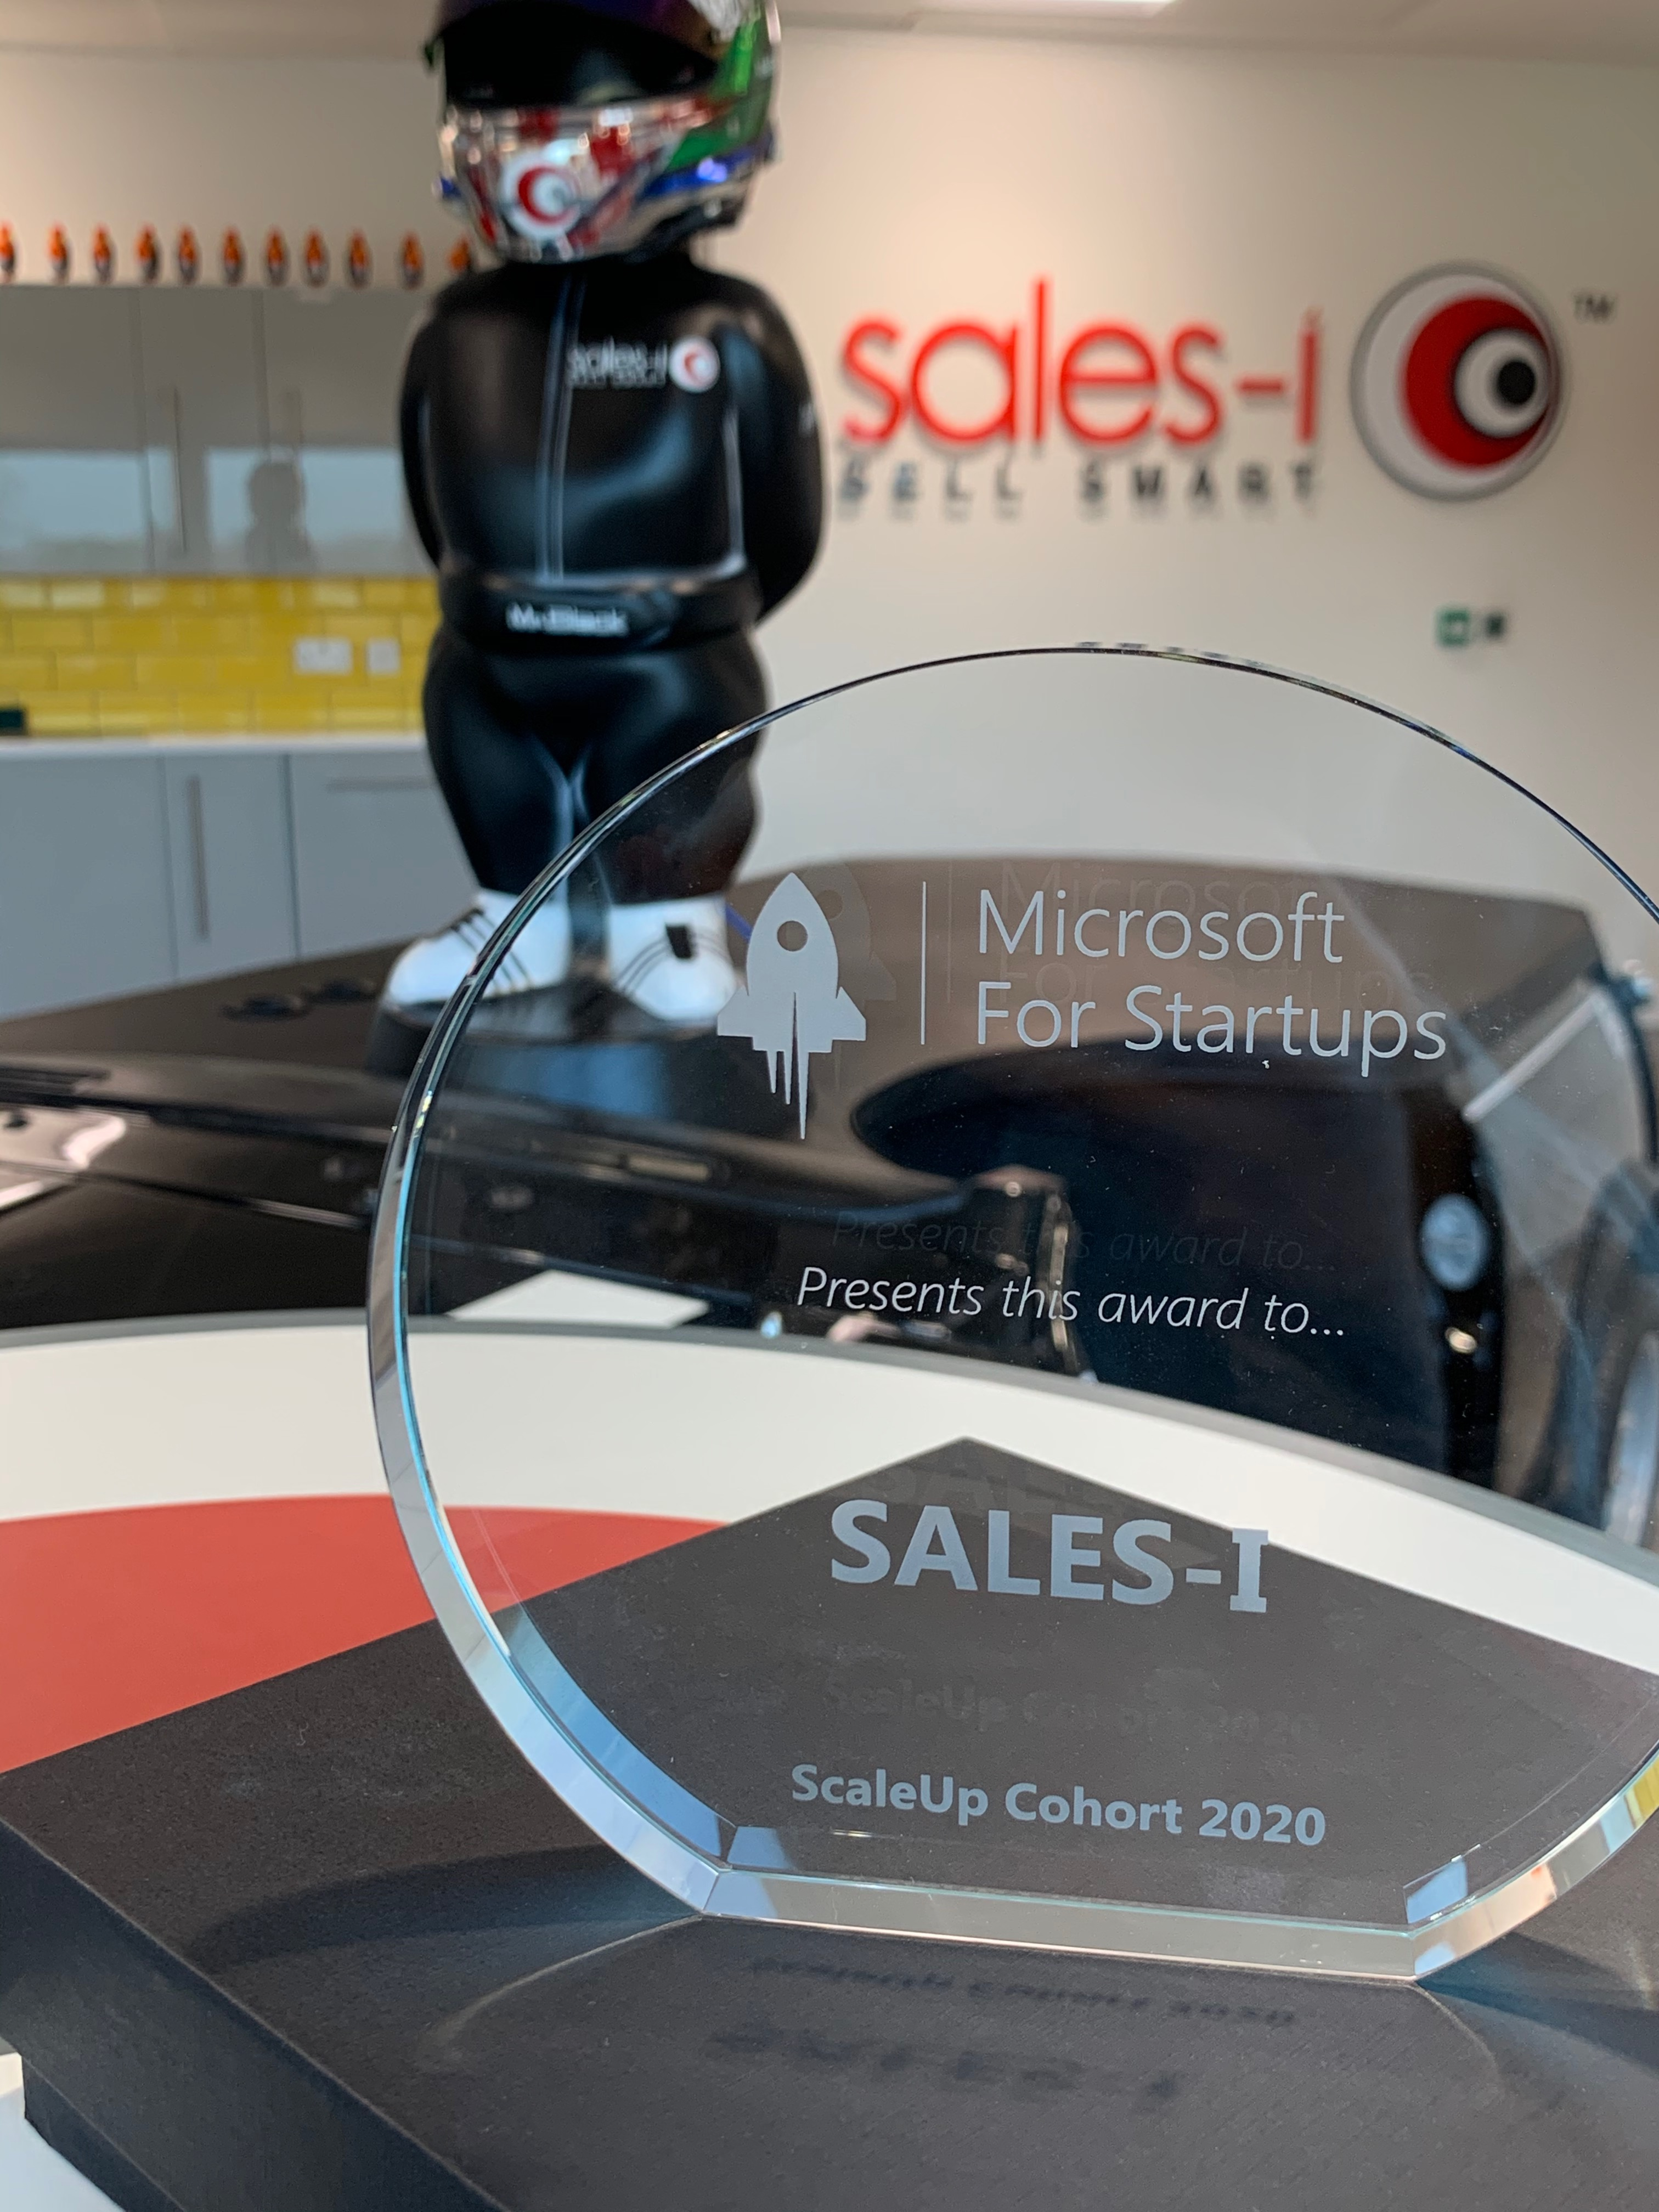 sales-i awarded with Microsoft ScaleUp Cohort 2020.